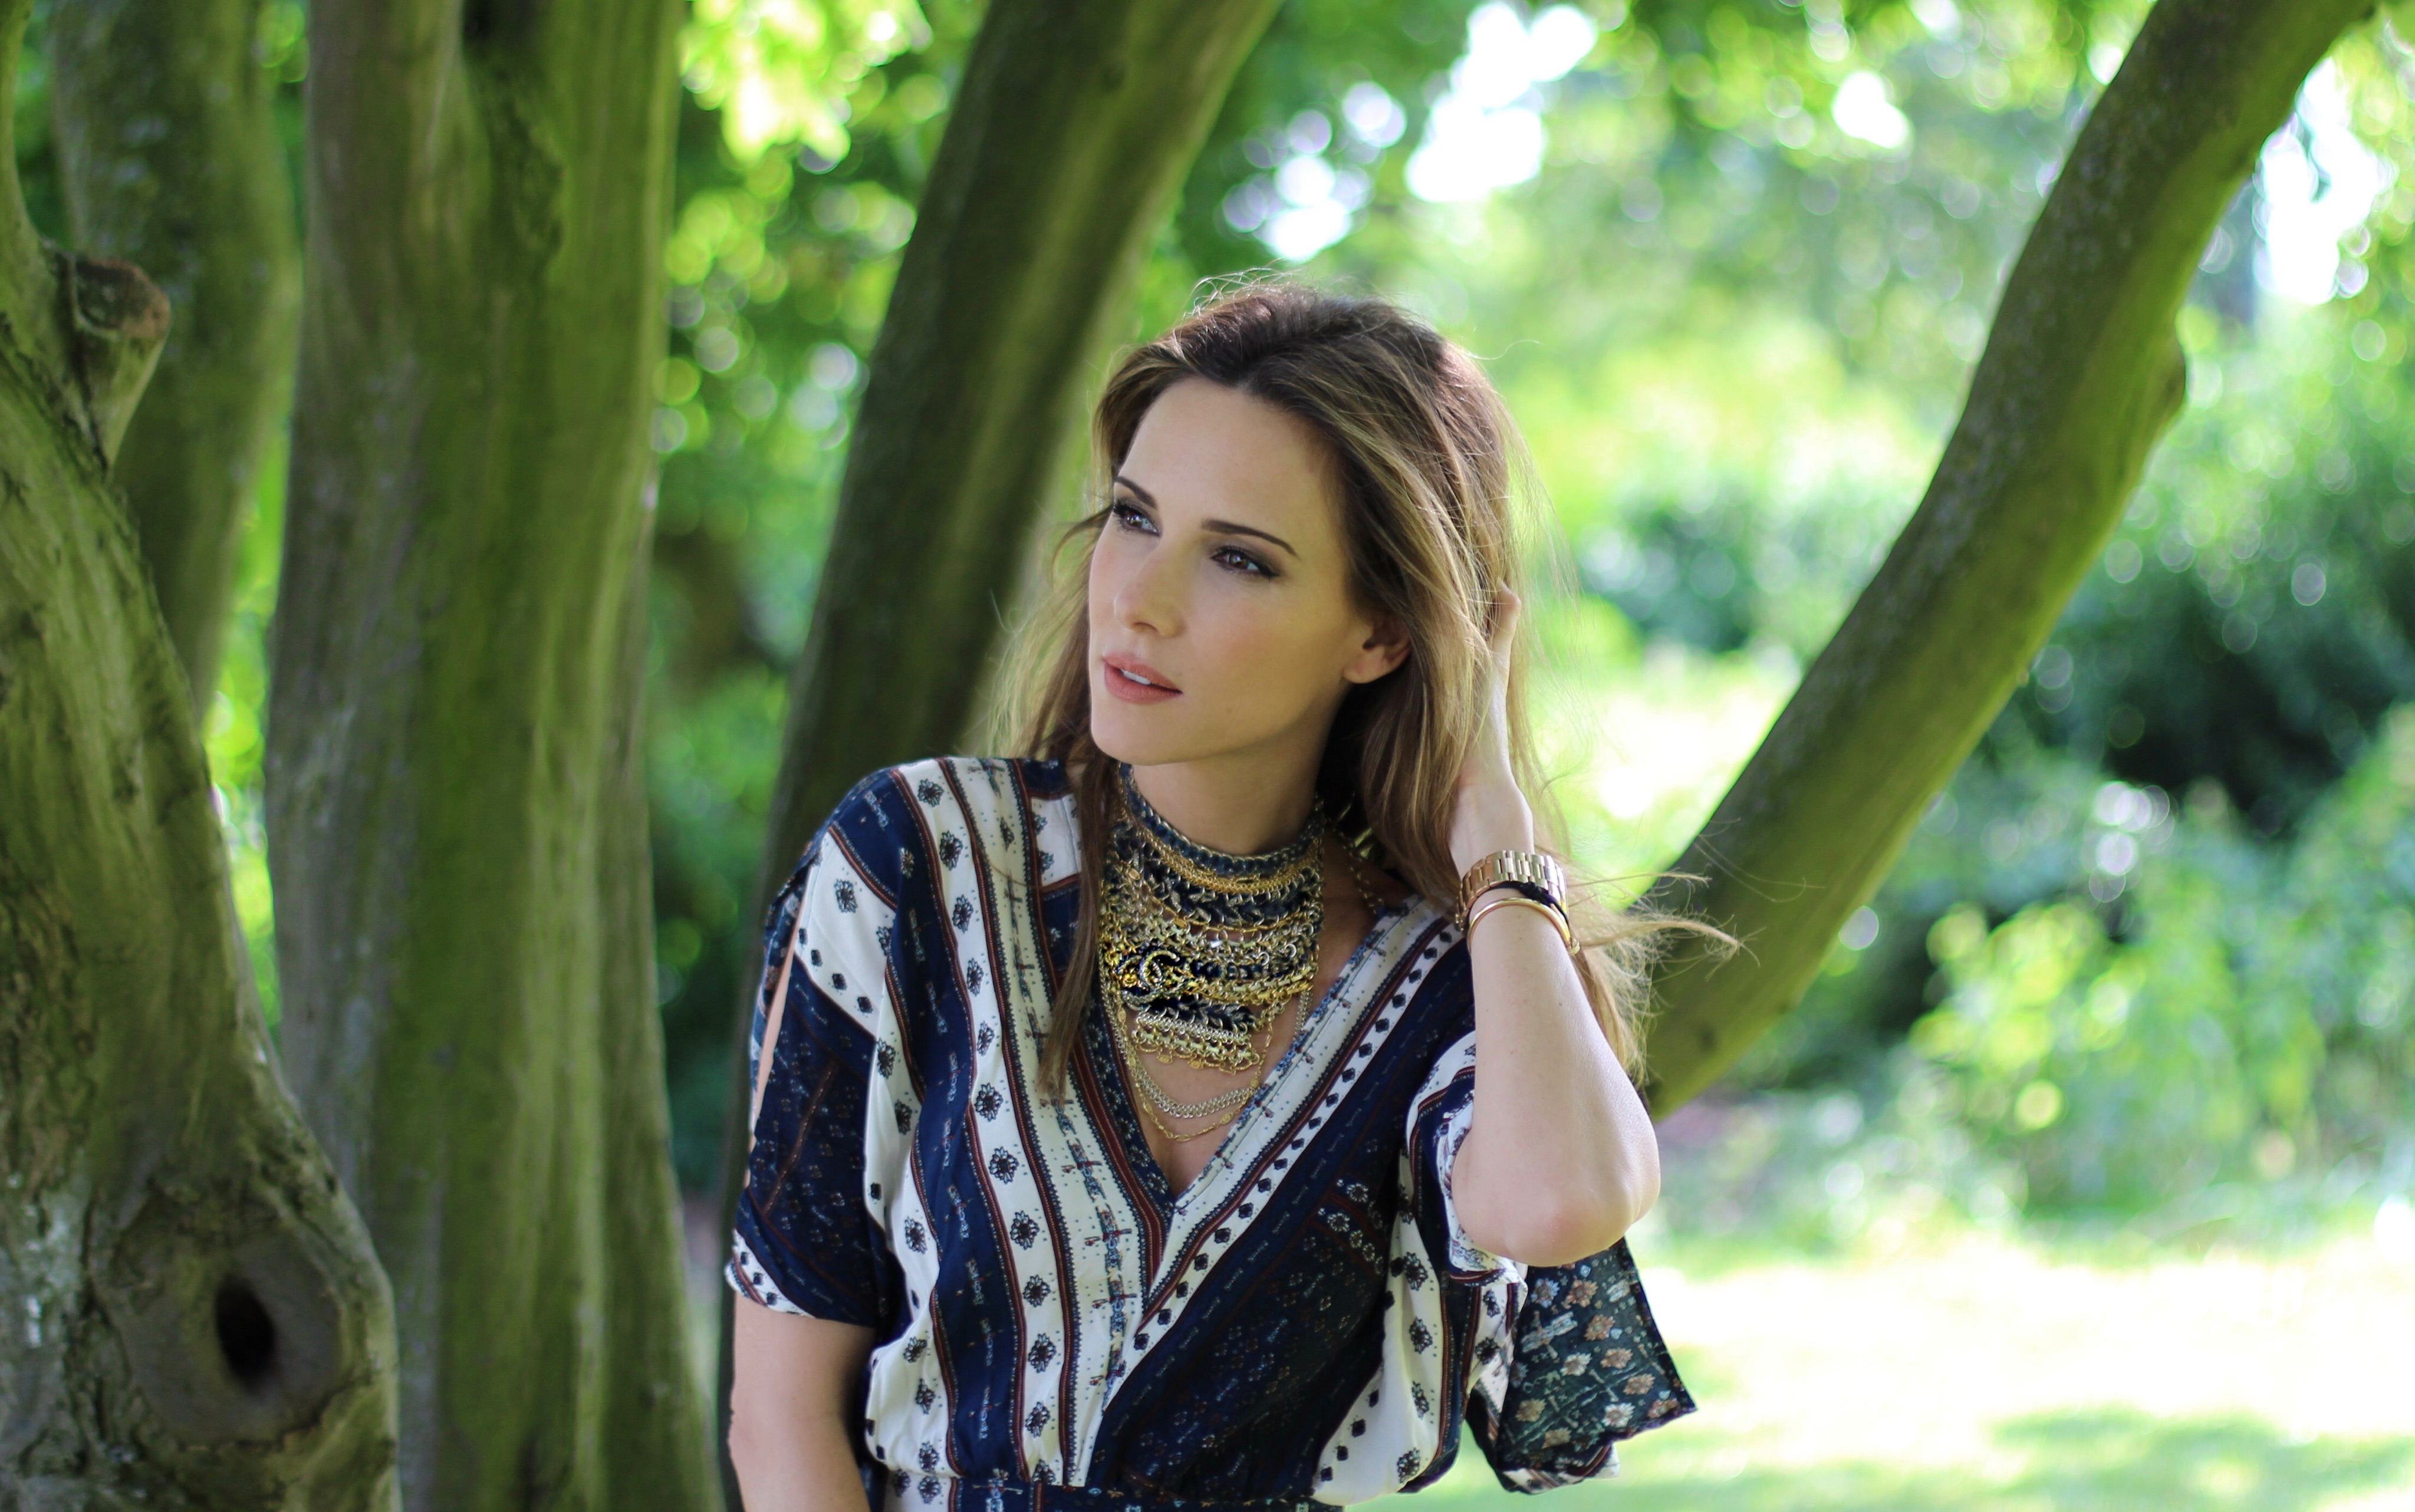 65544fe4e6 ... H M · Alexandra Lapp wearing Boho Chic